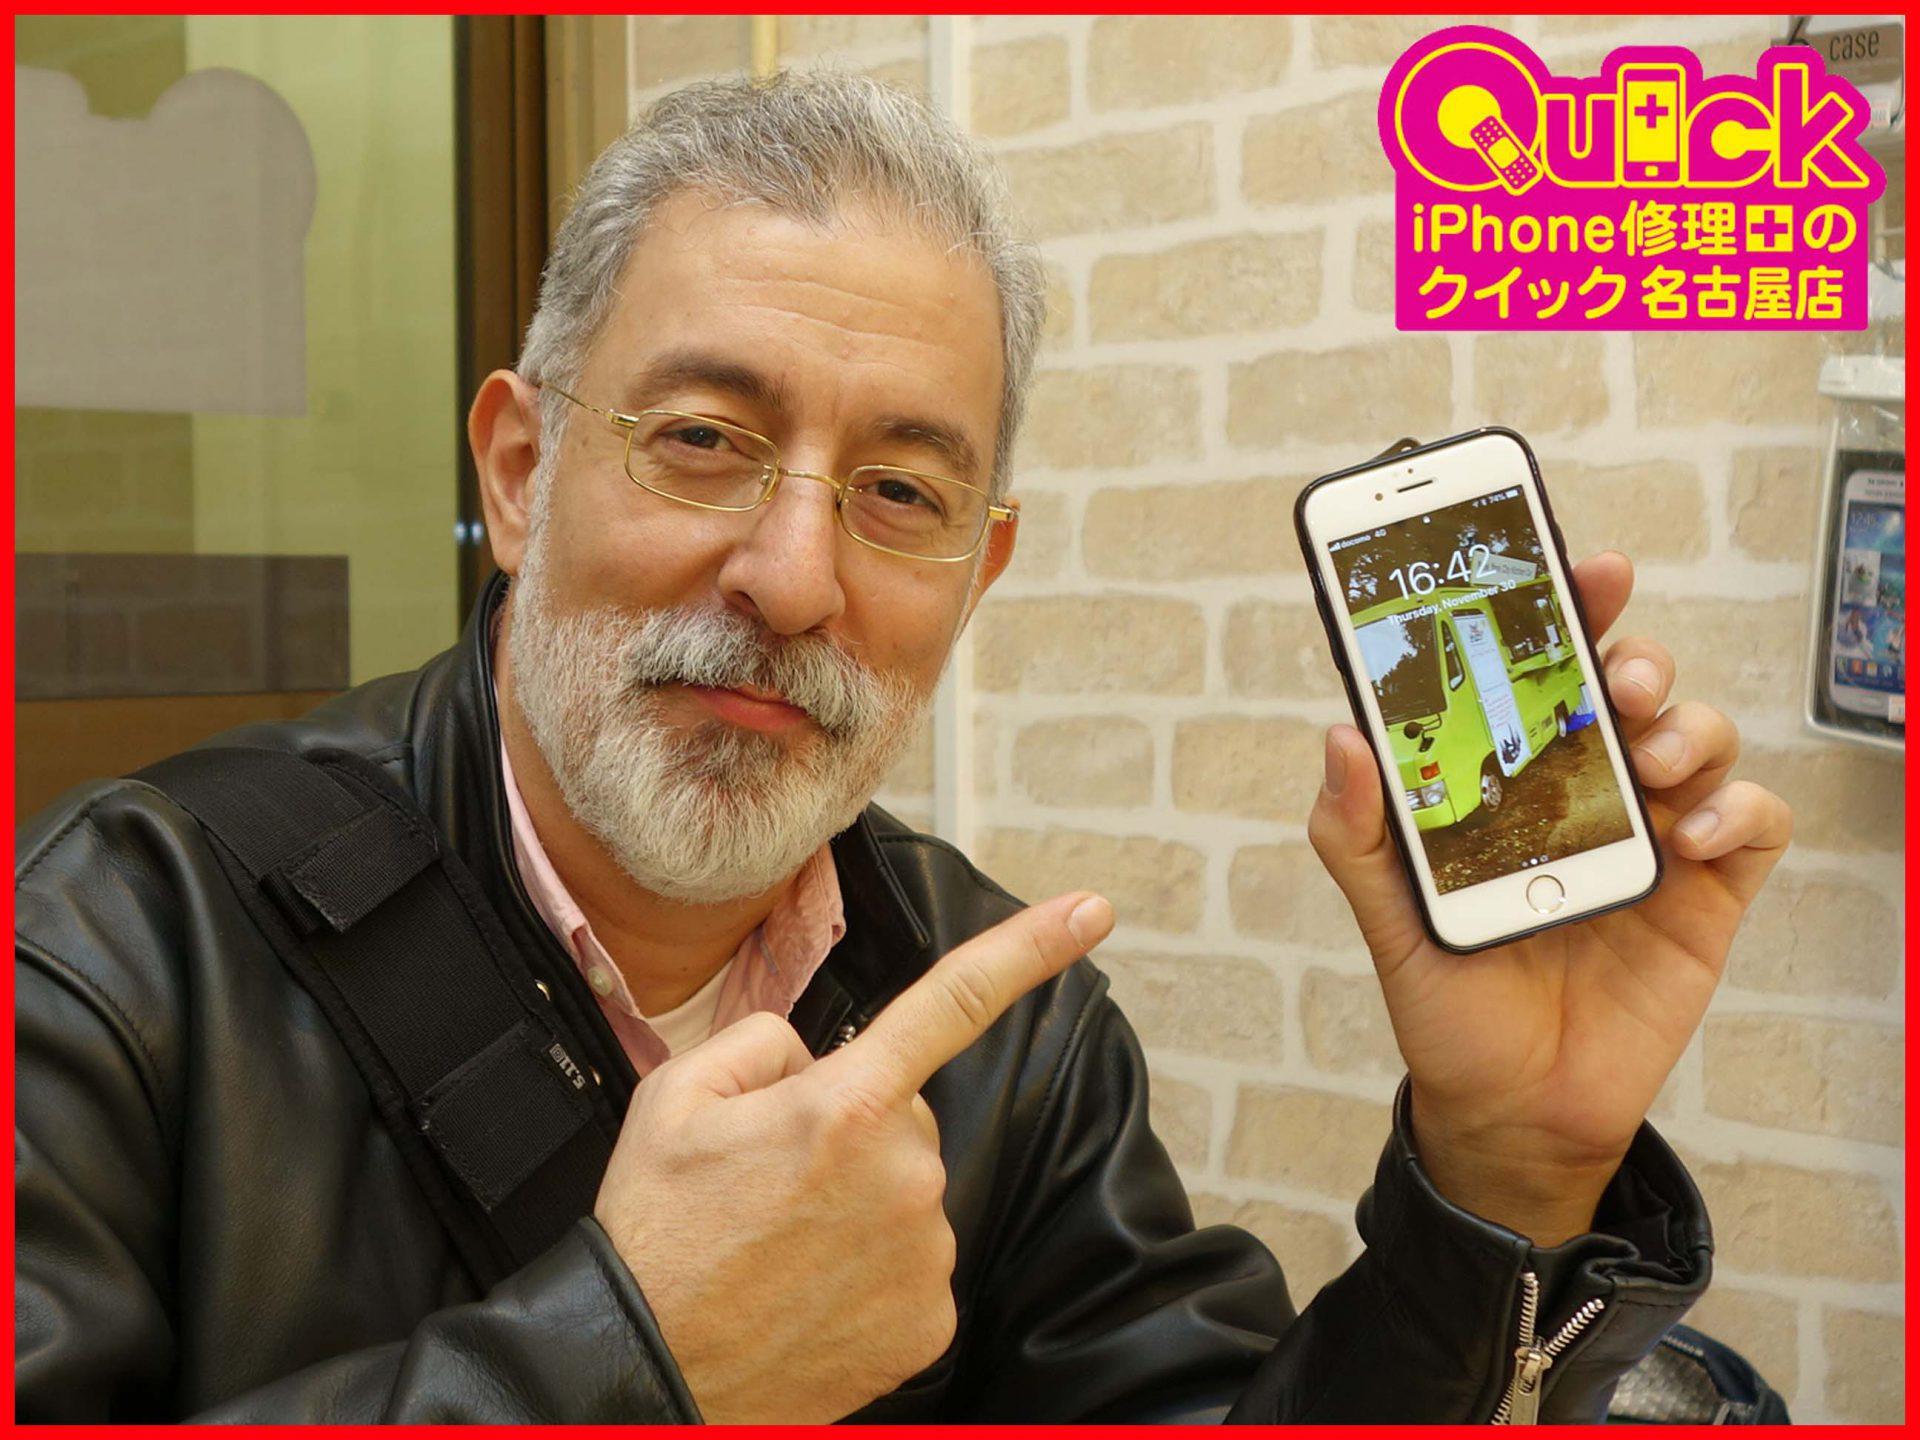 ☆iPhone6Sの液晶交換修理に名古屋市よりご来店!アイフォン修理のクイック岐阜